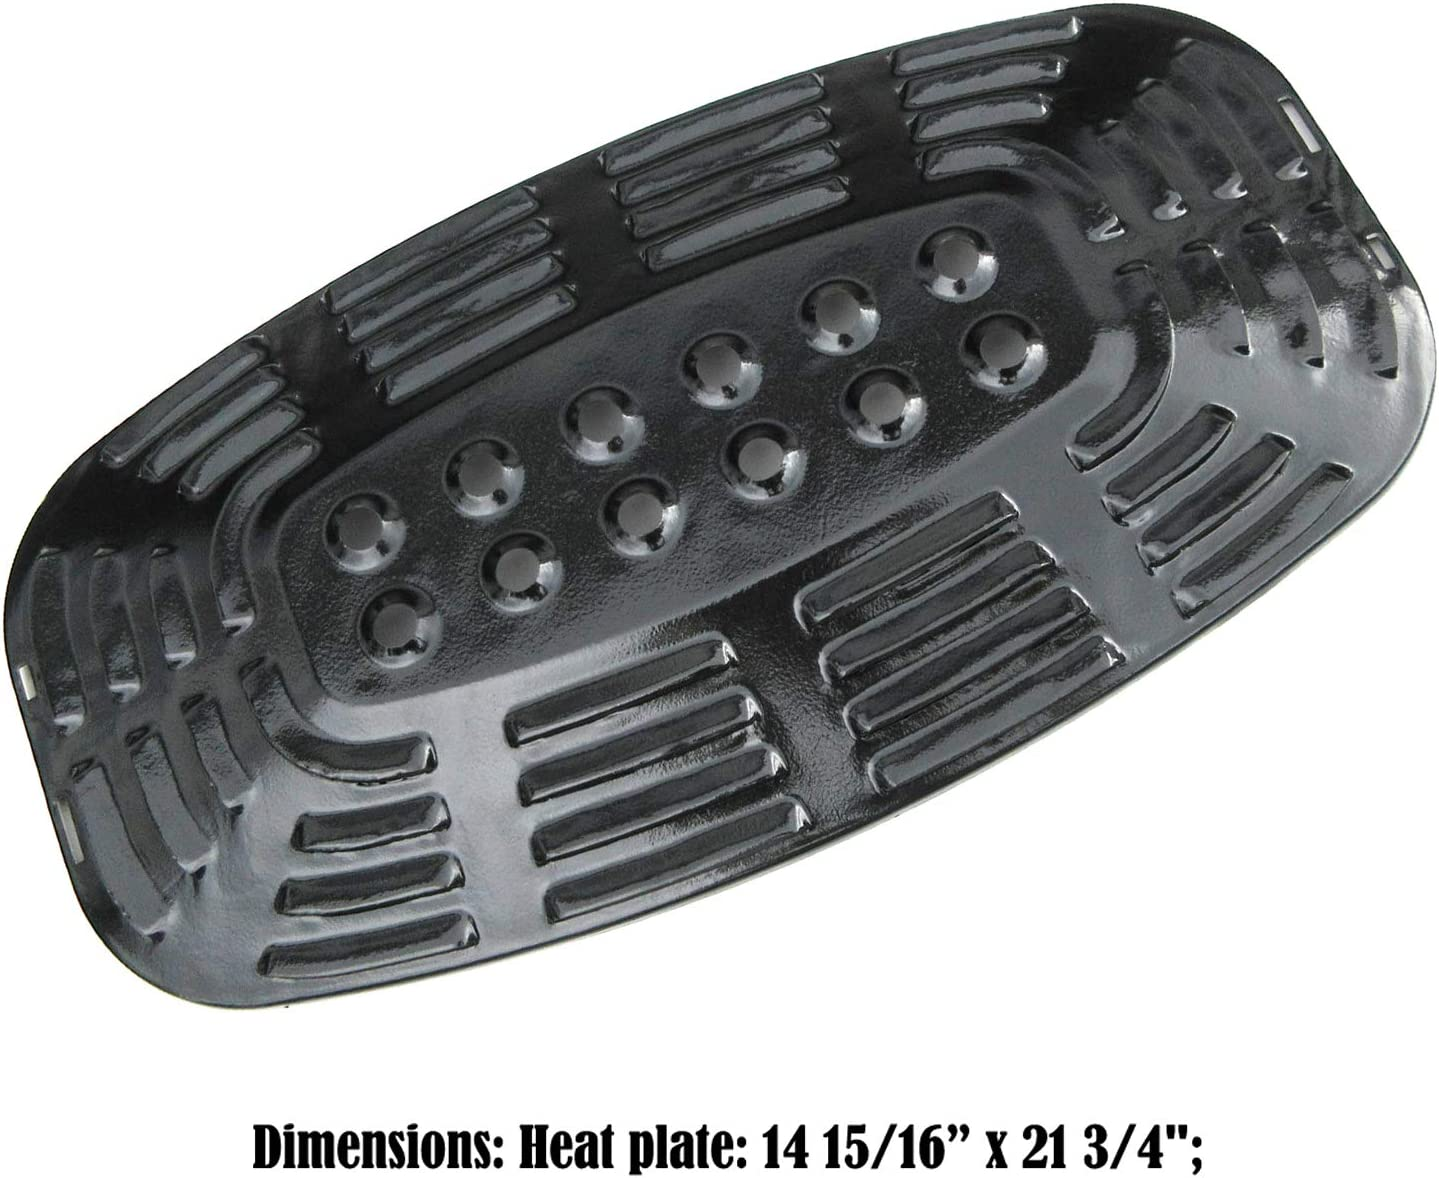 Uniflame GBC730W Porcelain Steel Heat Plate Replacement Part